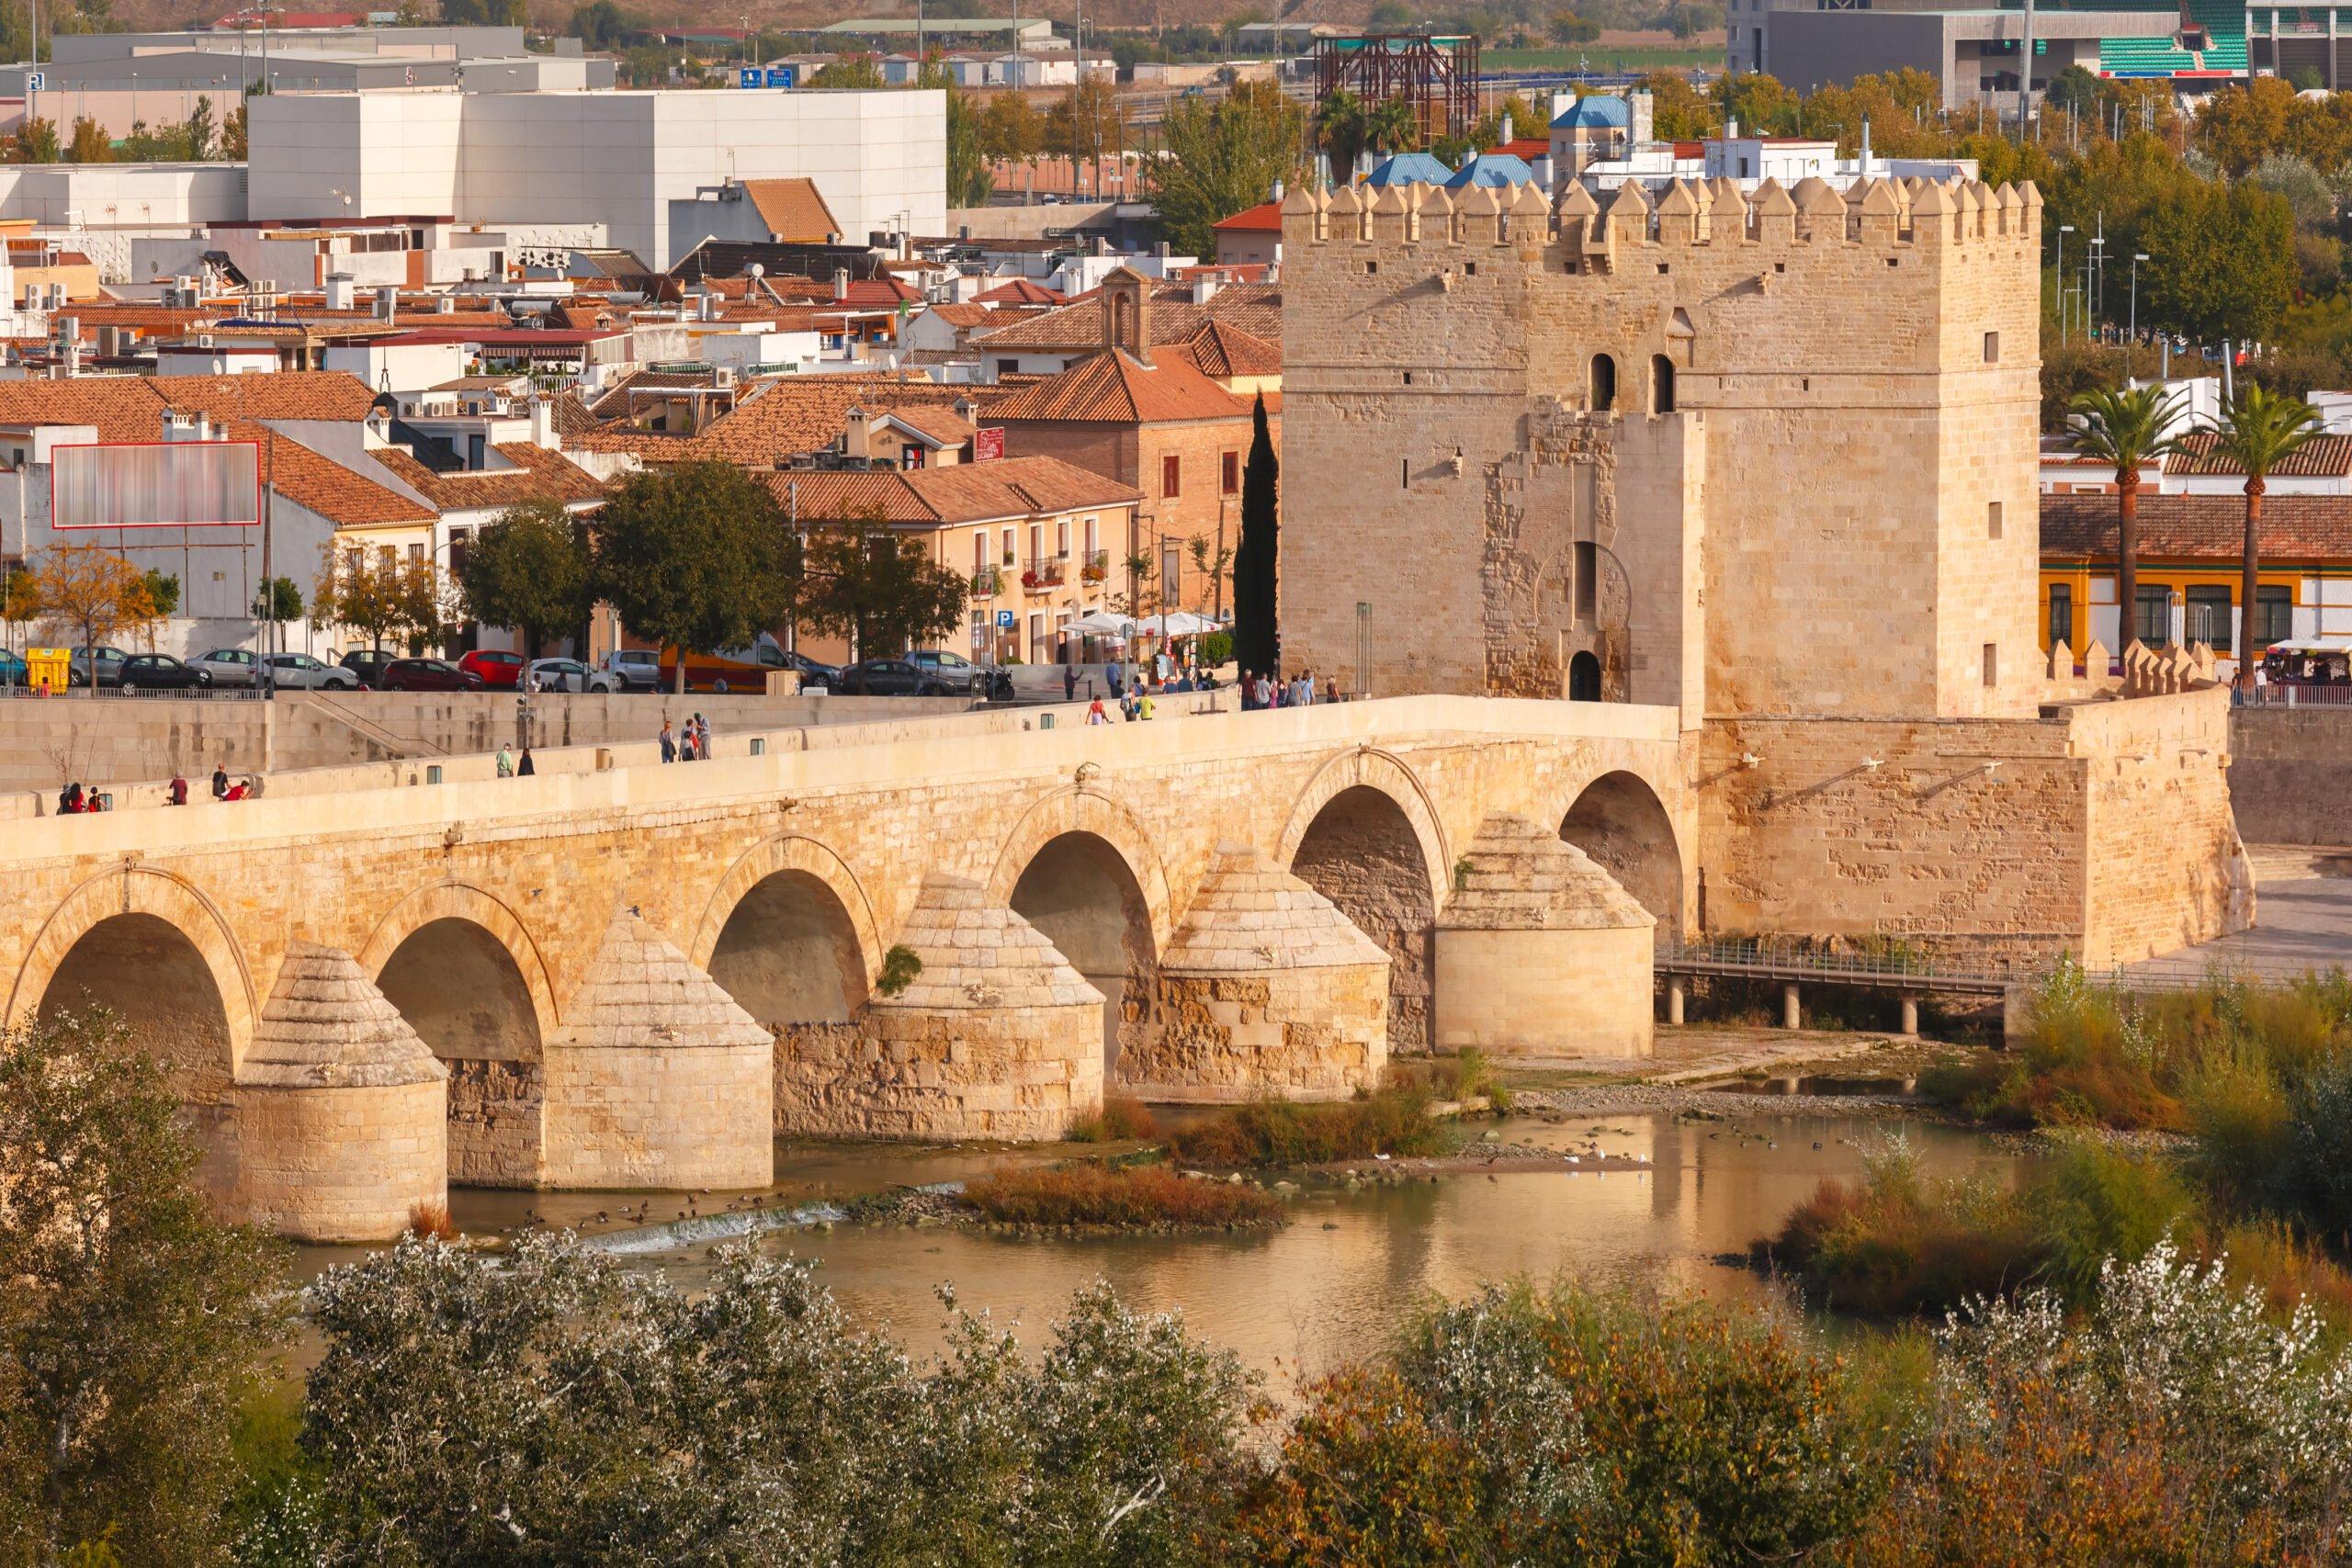 Admire The Roman Bridge Over The Guadalquivir River On The Cordoba Tour From Granada